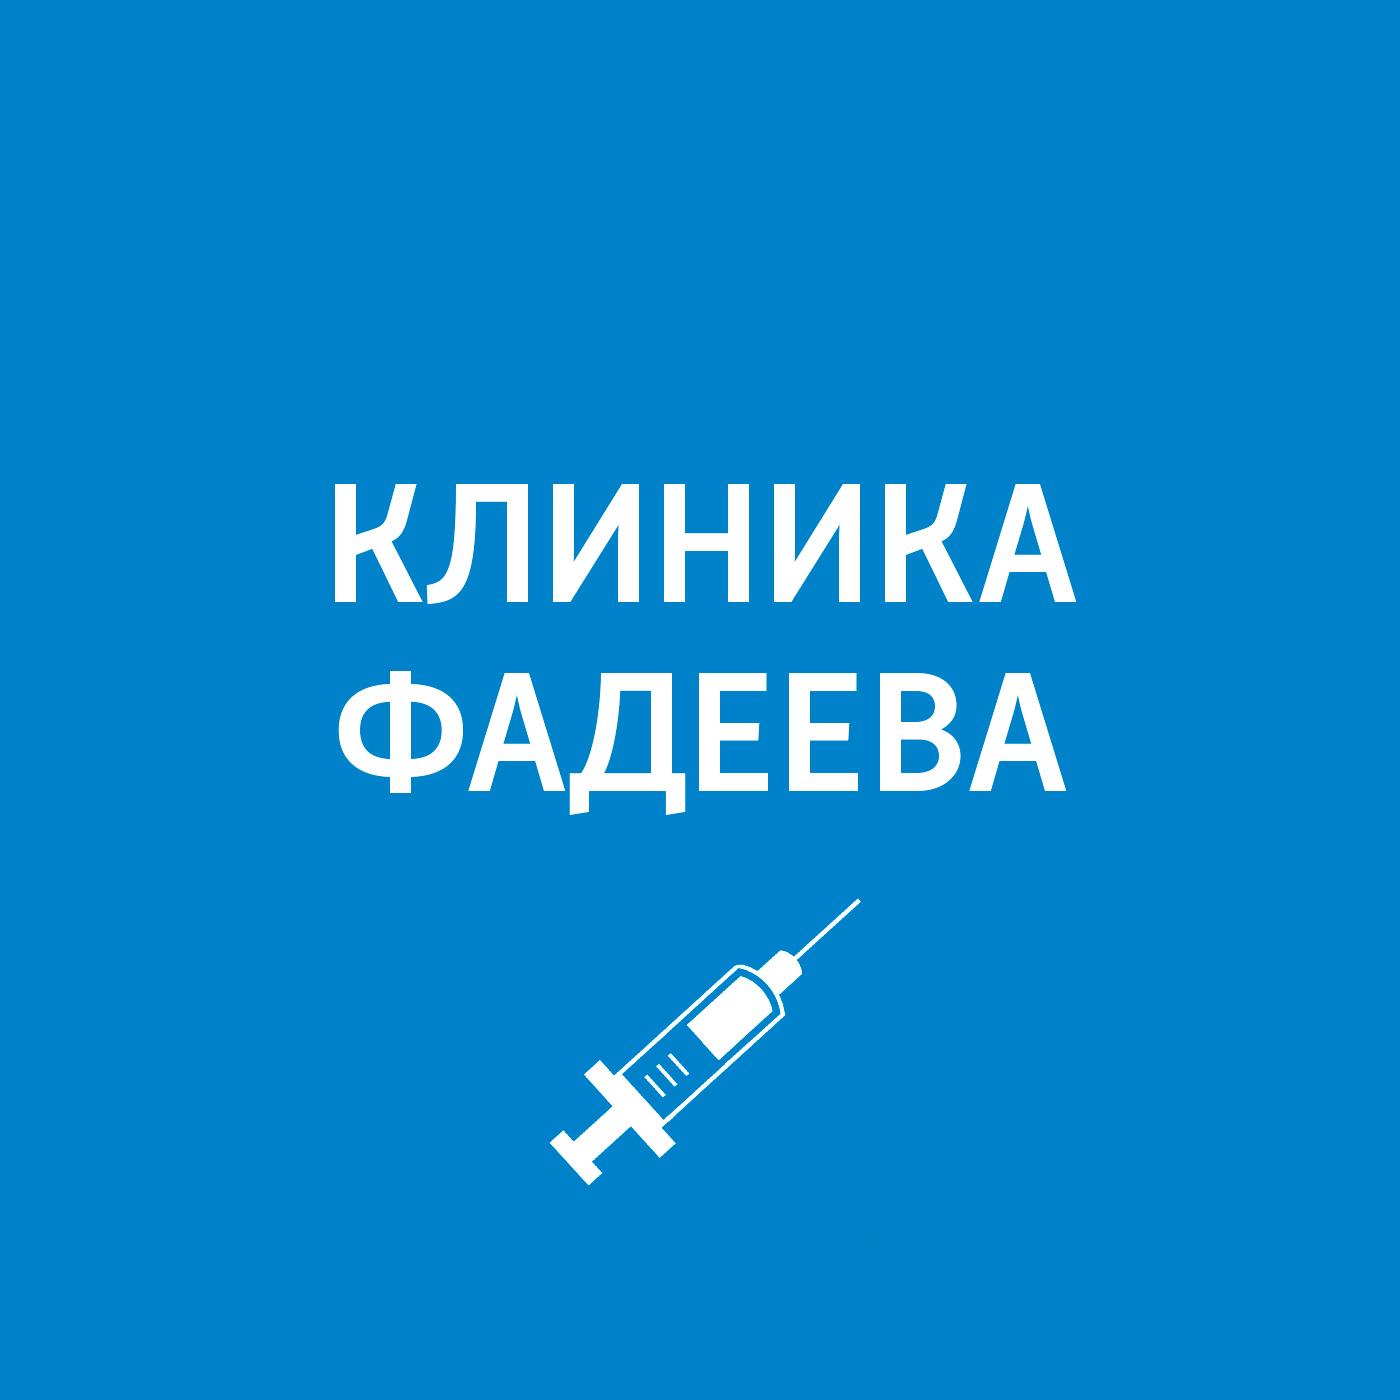 Фото - Пётр Фадеев Врач-стоматолог пётр фадеев врач неотложной помощи